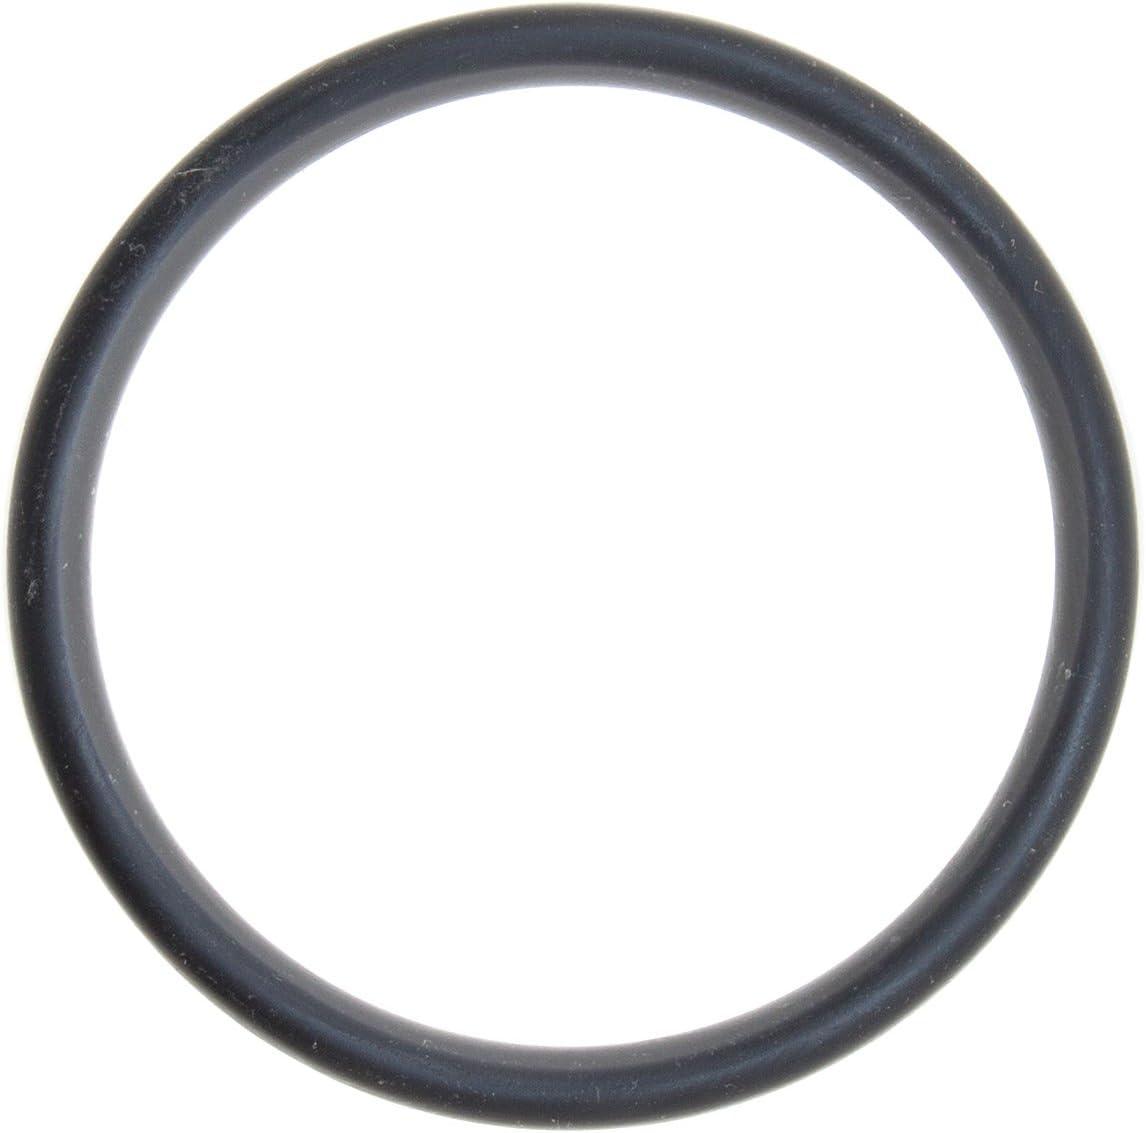 70A 70A O-Ring NBR 55,00x3,50 mm Innen /Ø:55,00mm Schnur/Ø:3,50mm Werkstoff:NBR